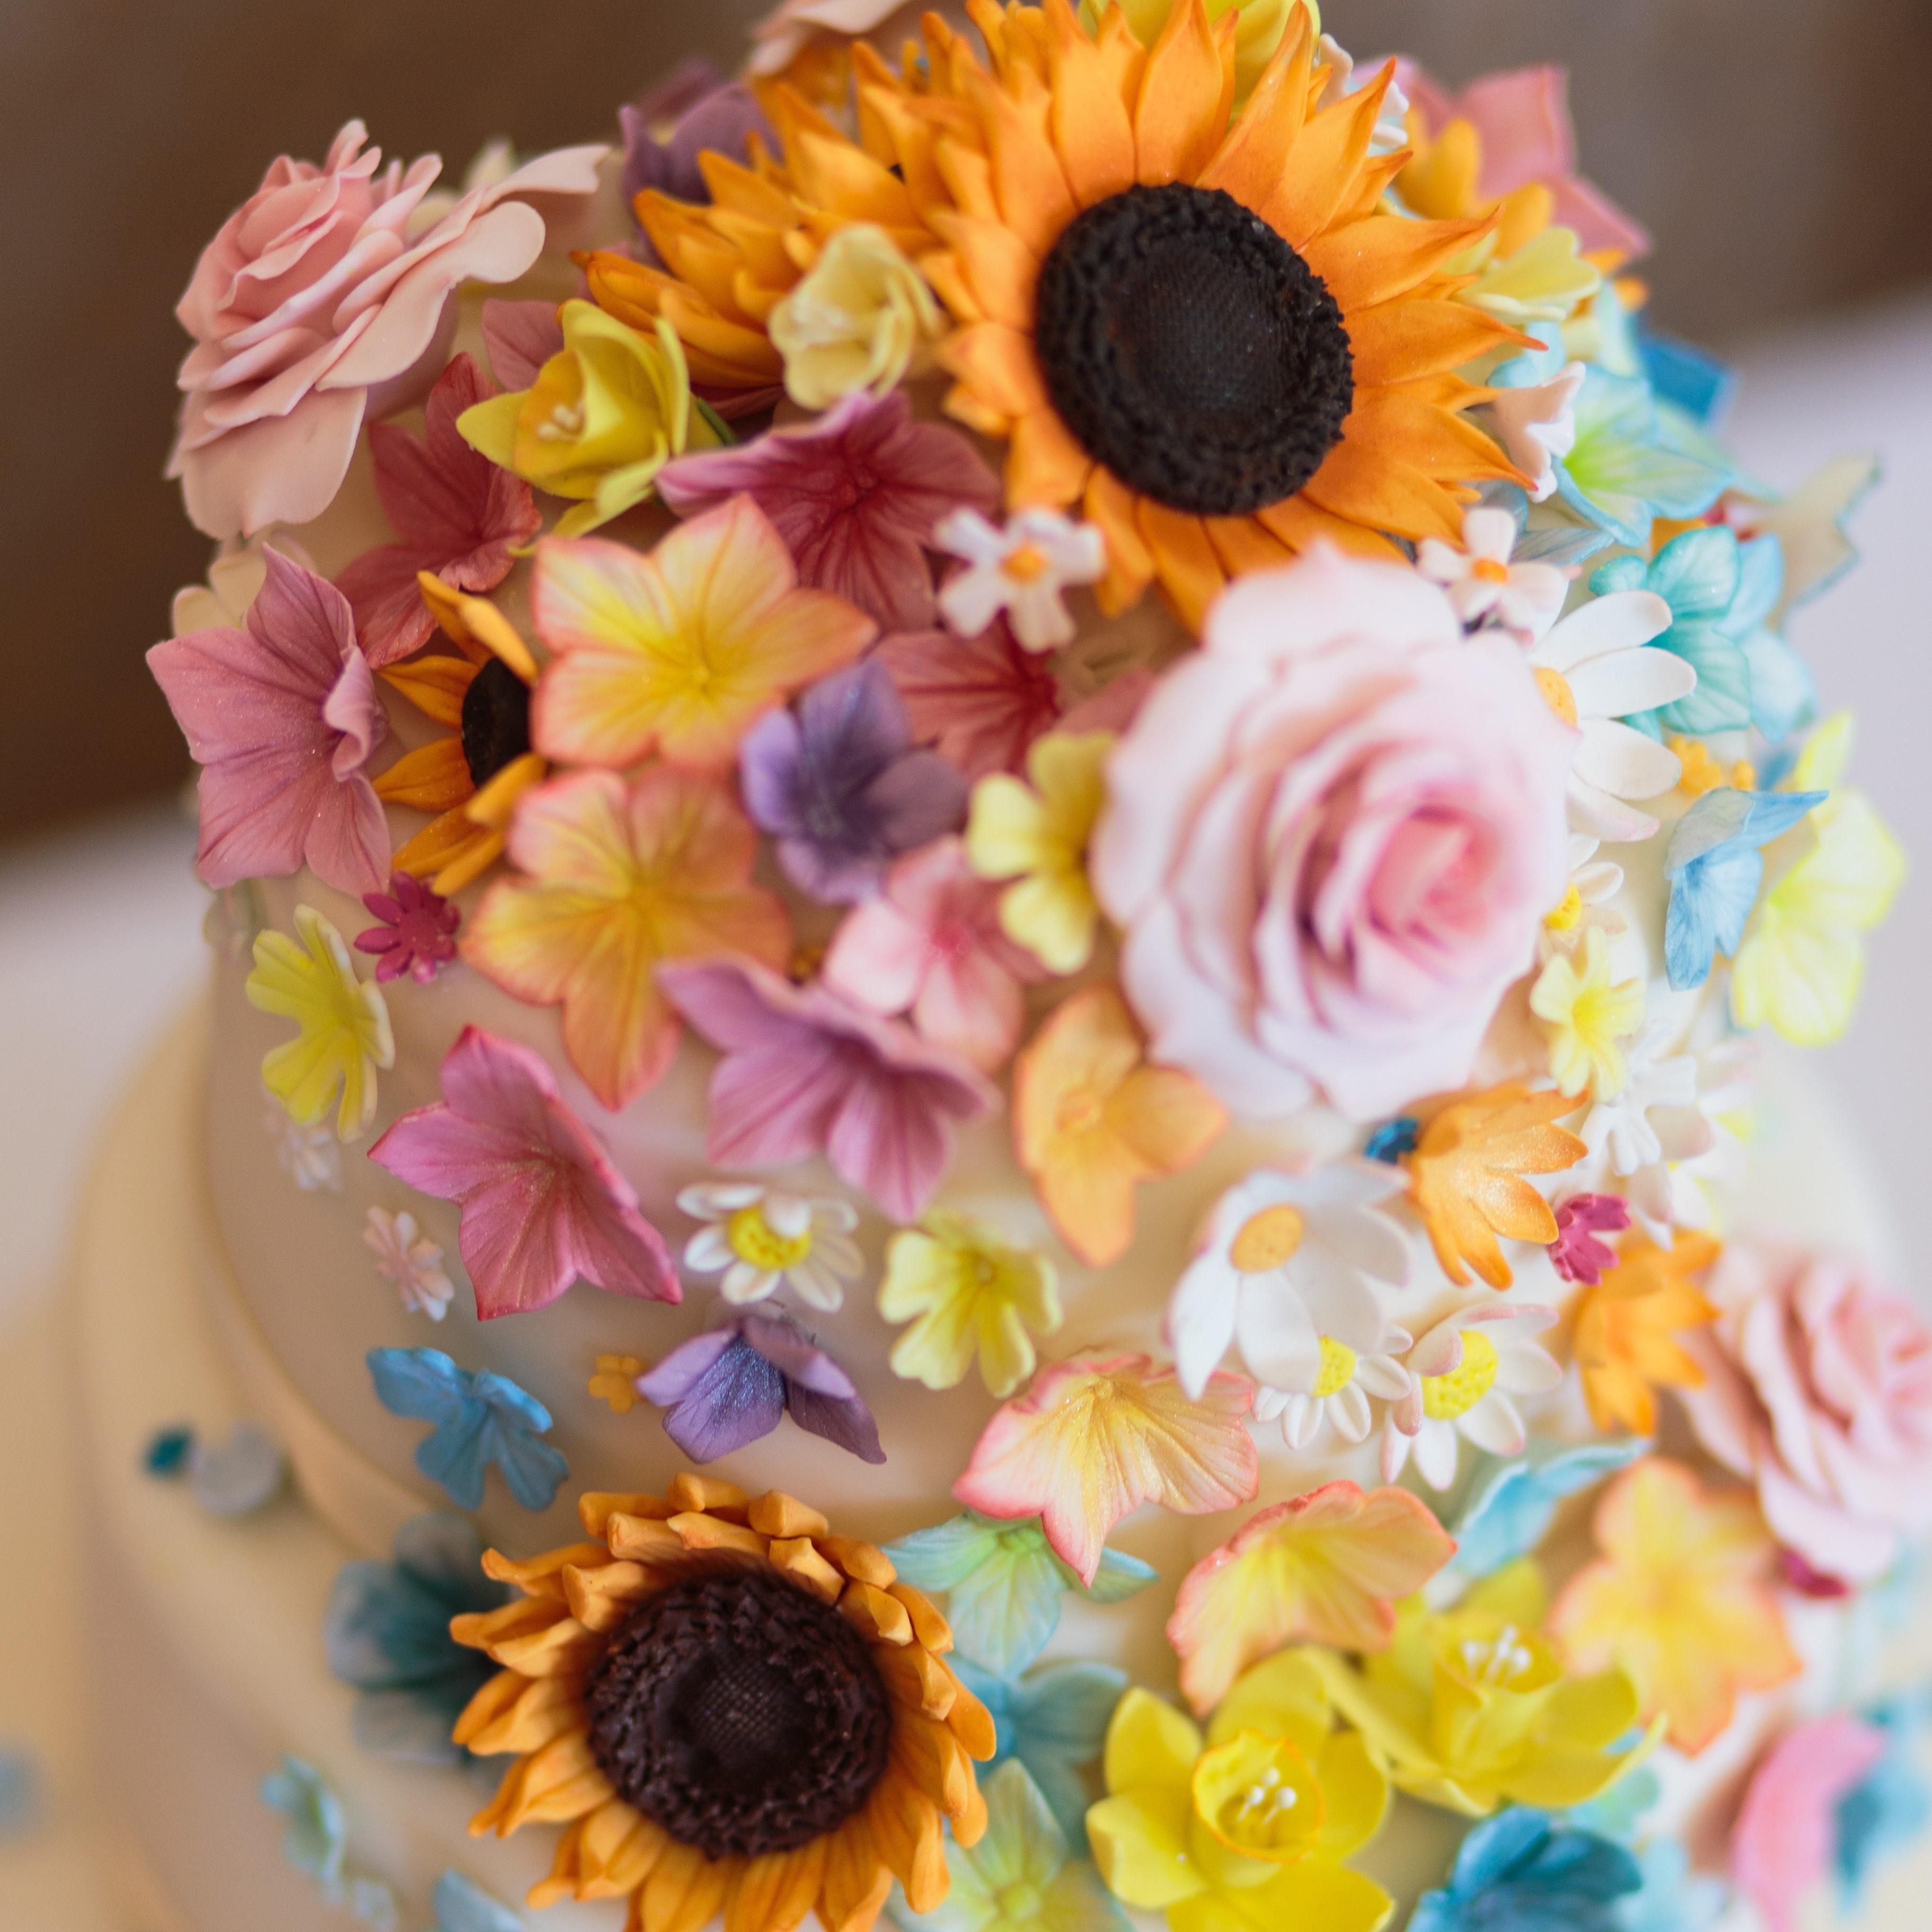 handmade cake decorations